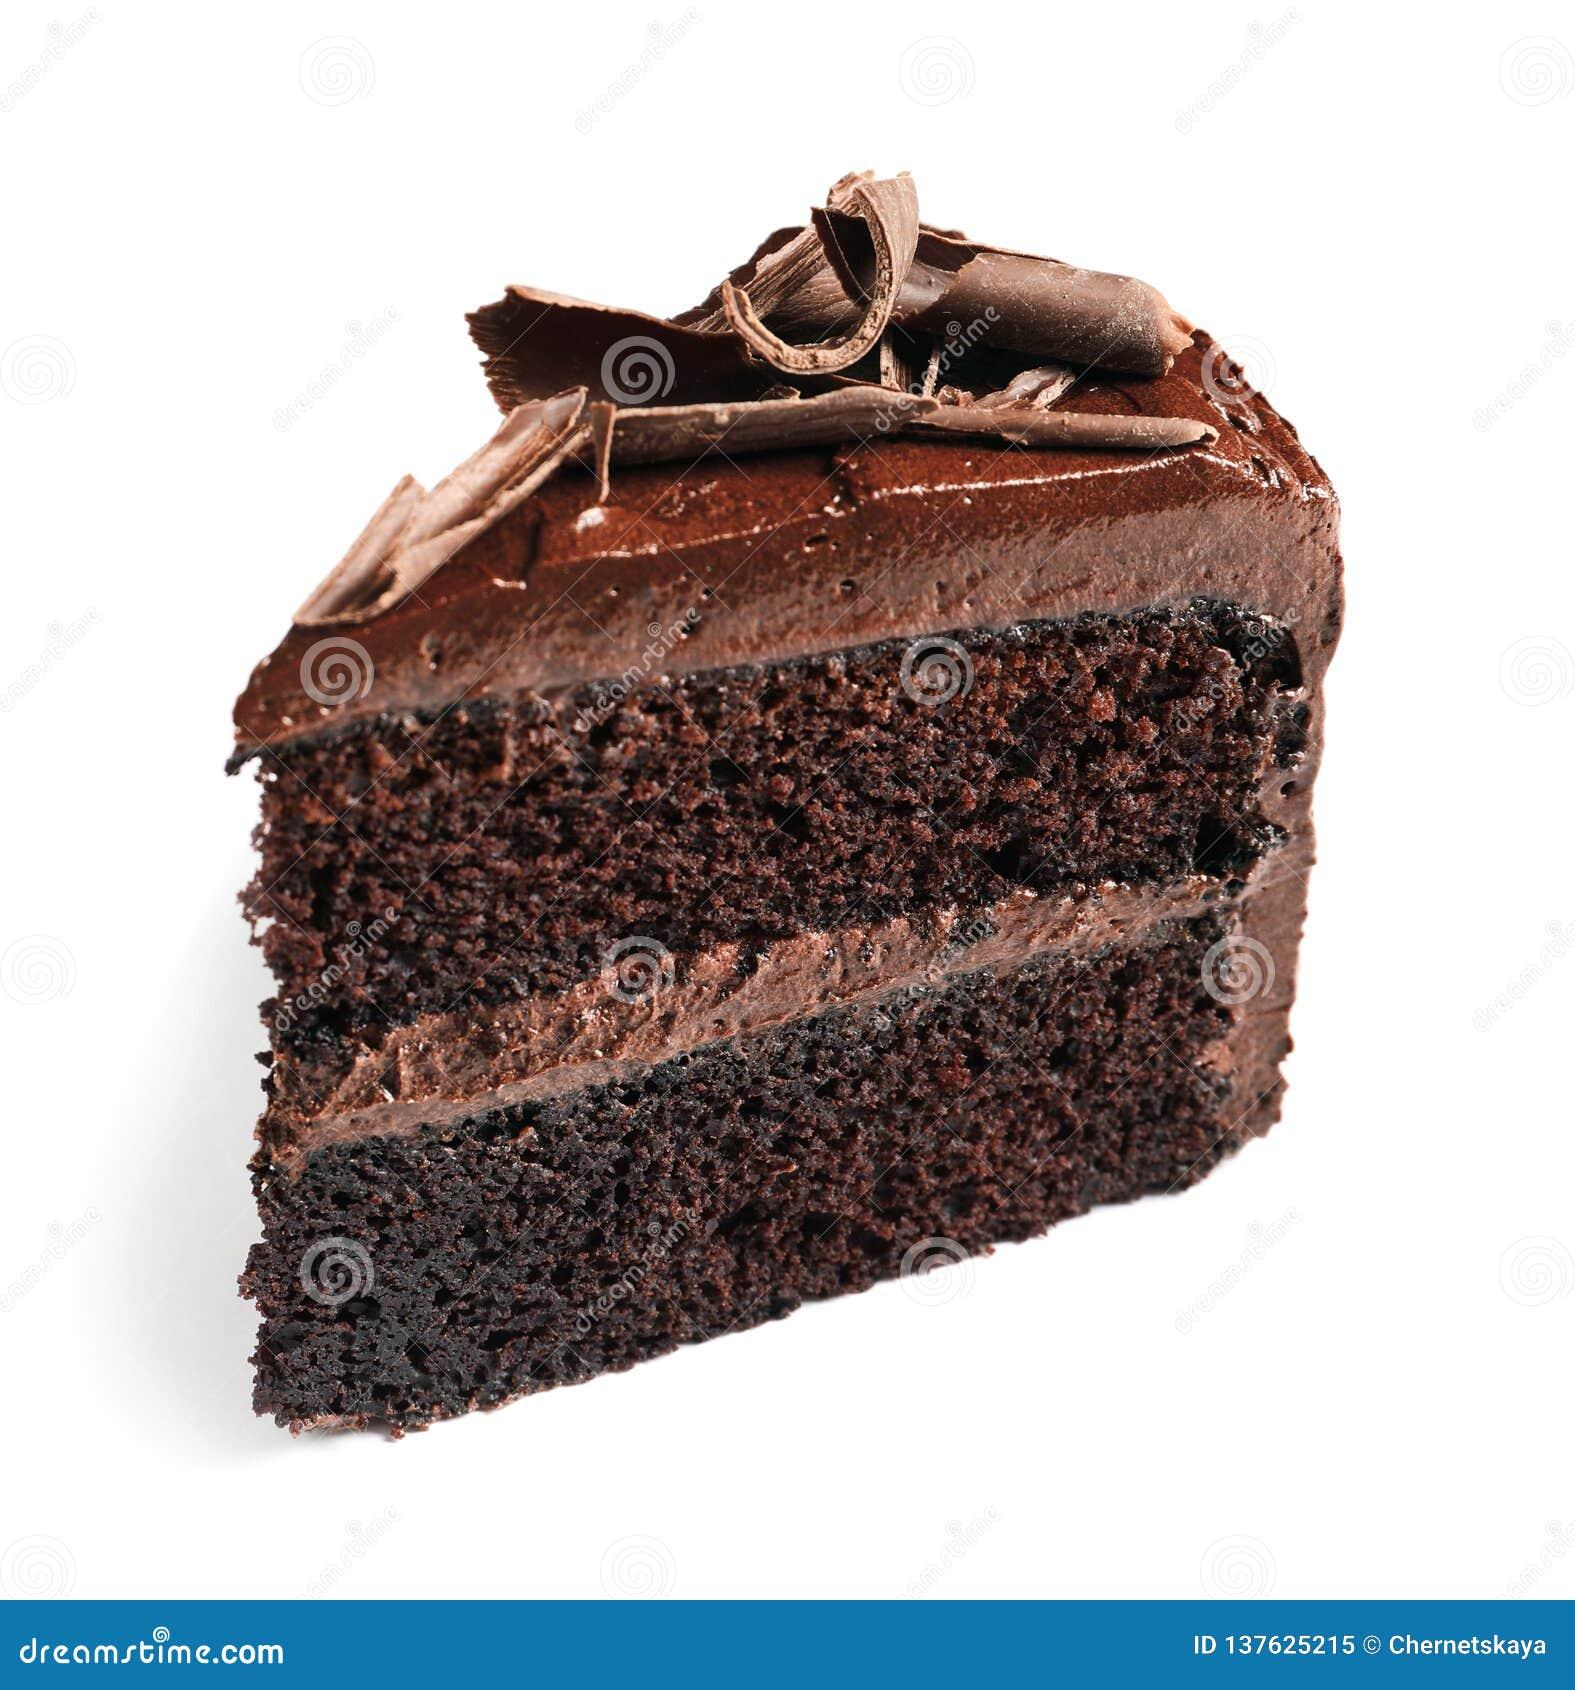 Piece of tasty homemade chocolate cake